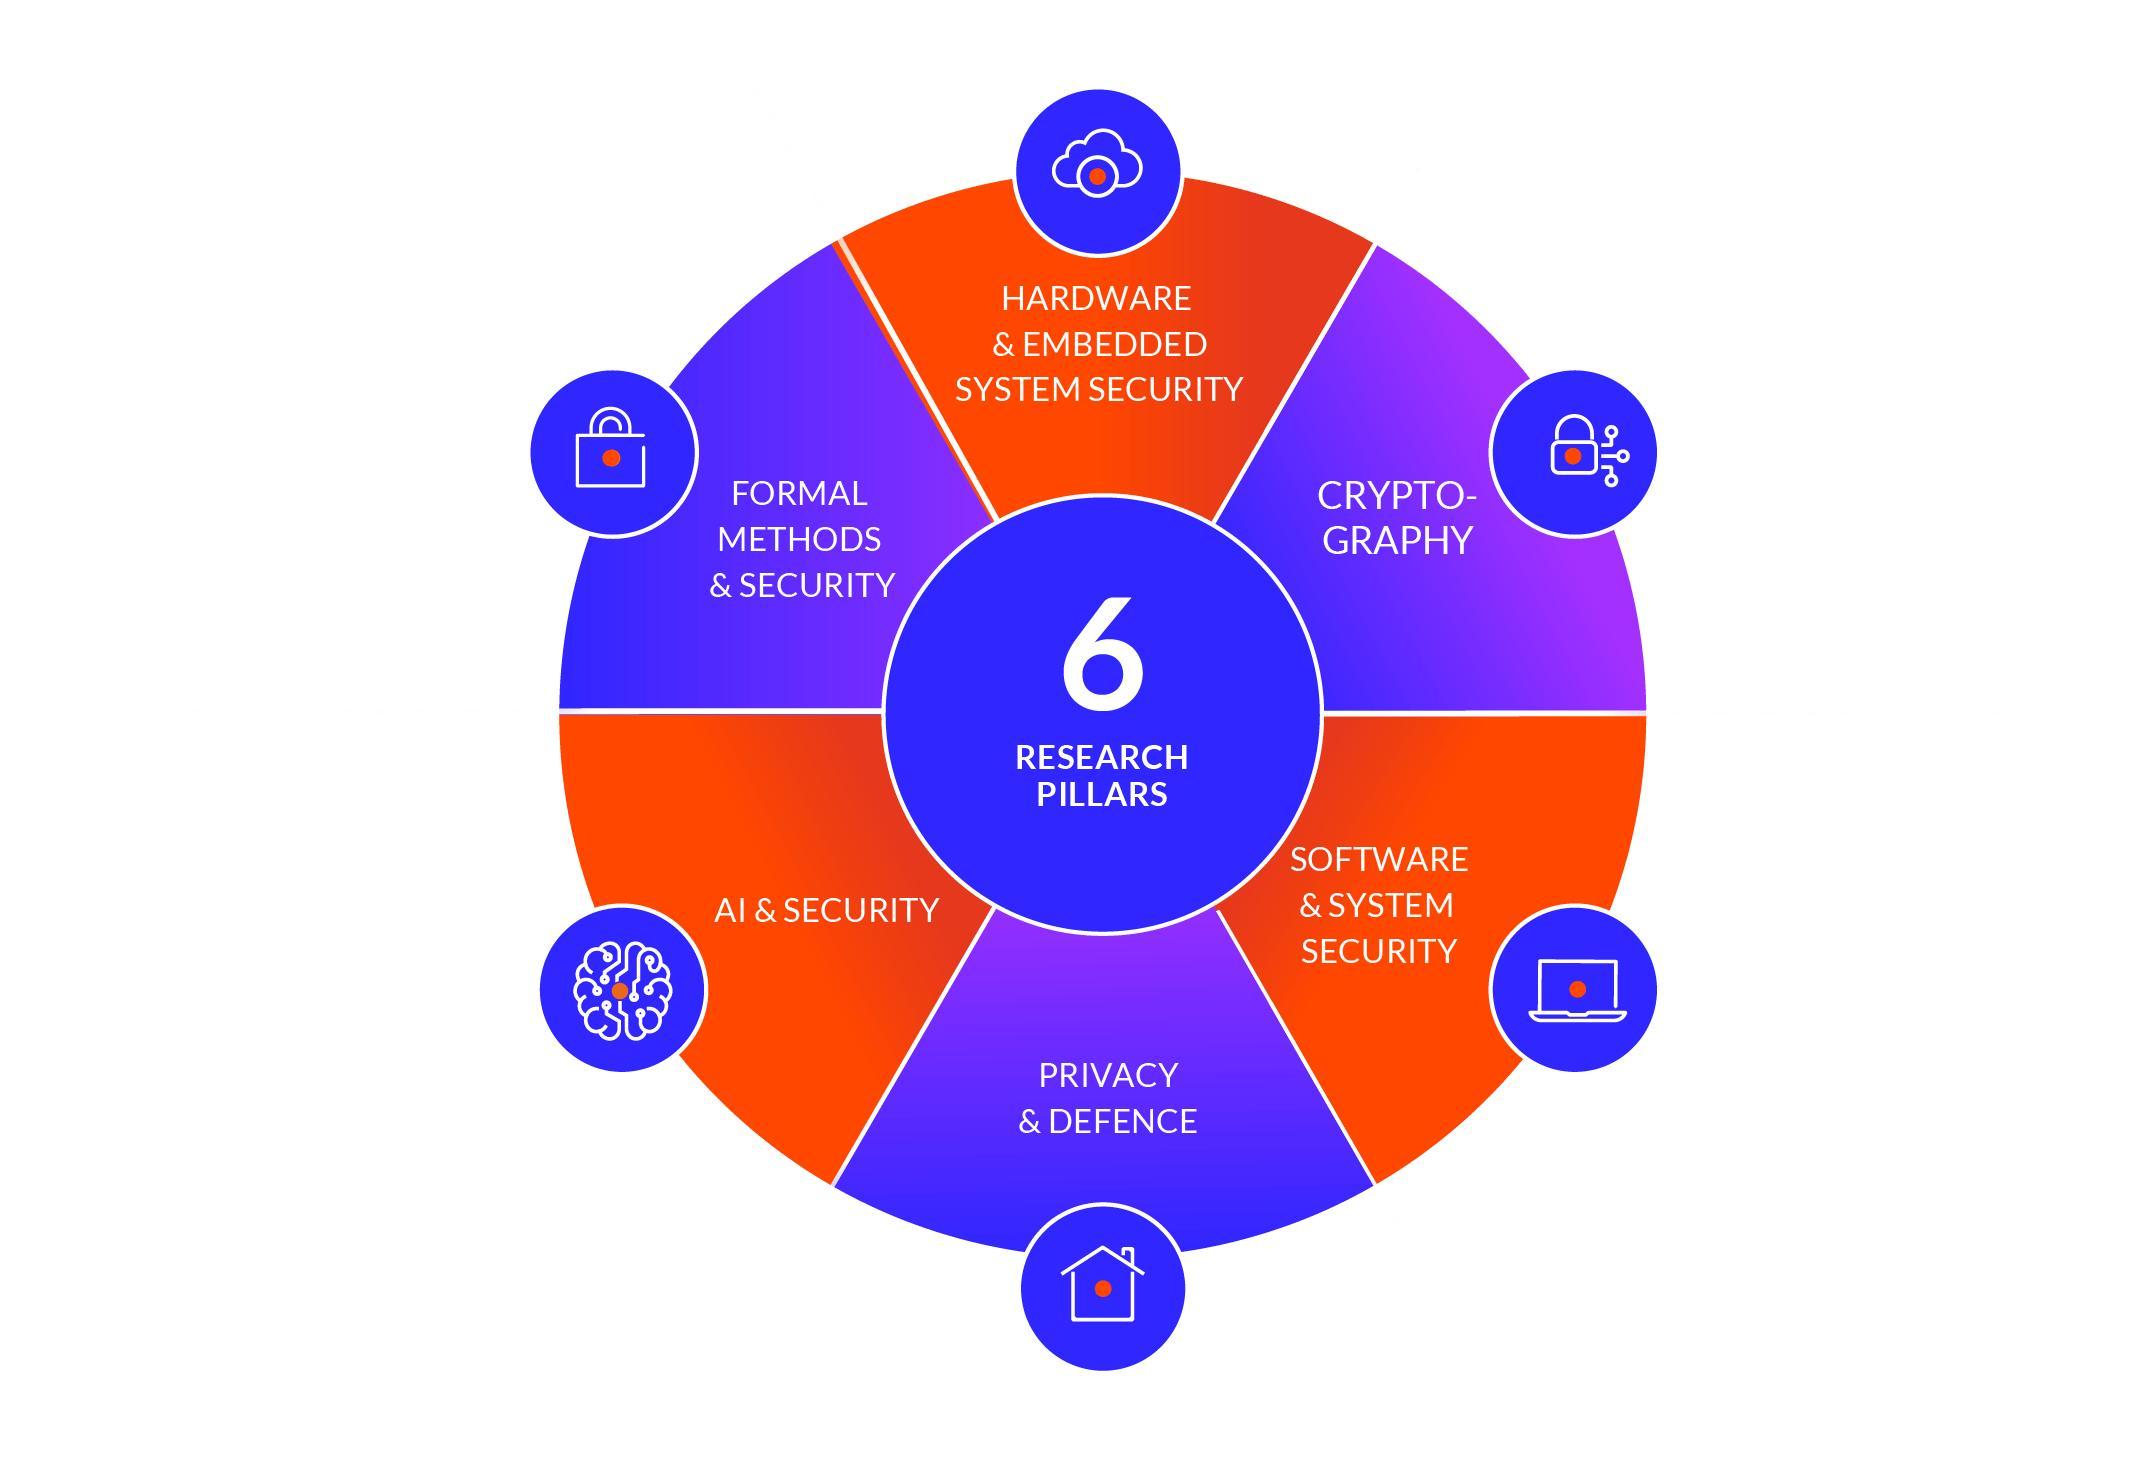 6 Research Pillars